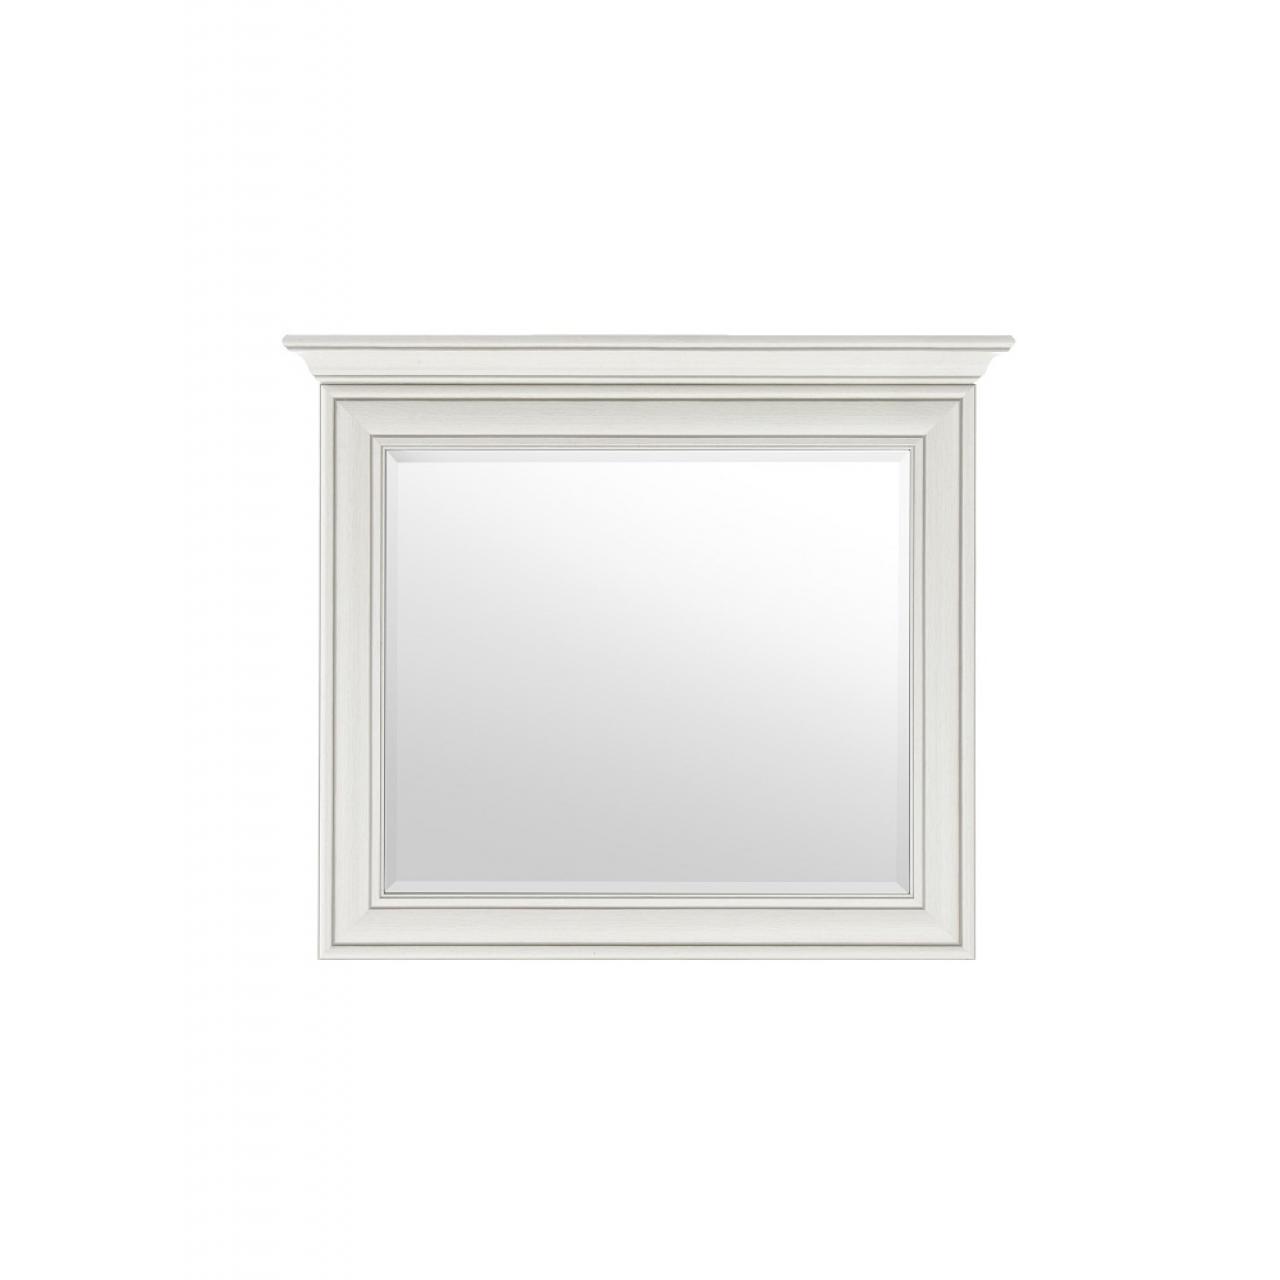 Wandspiegel Venedig 54-177-17-1 MDF Used Look White Flurspiegel Dekoration Flur